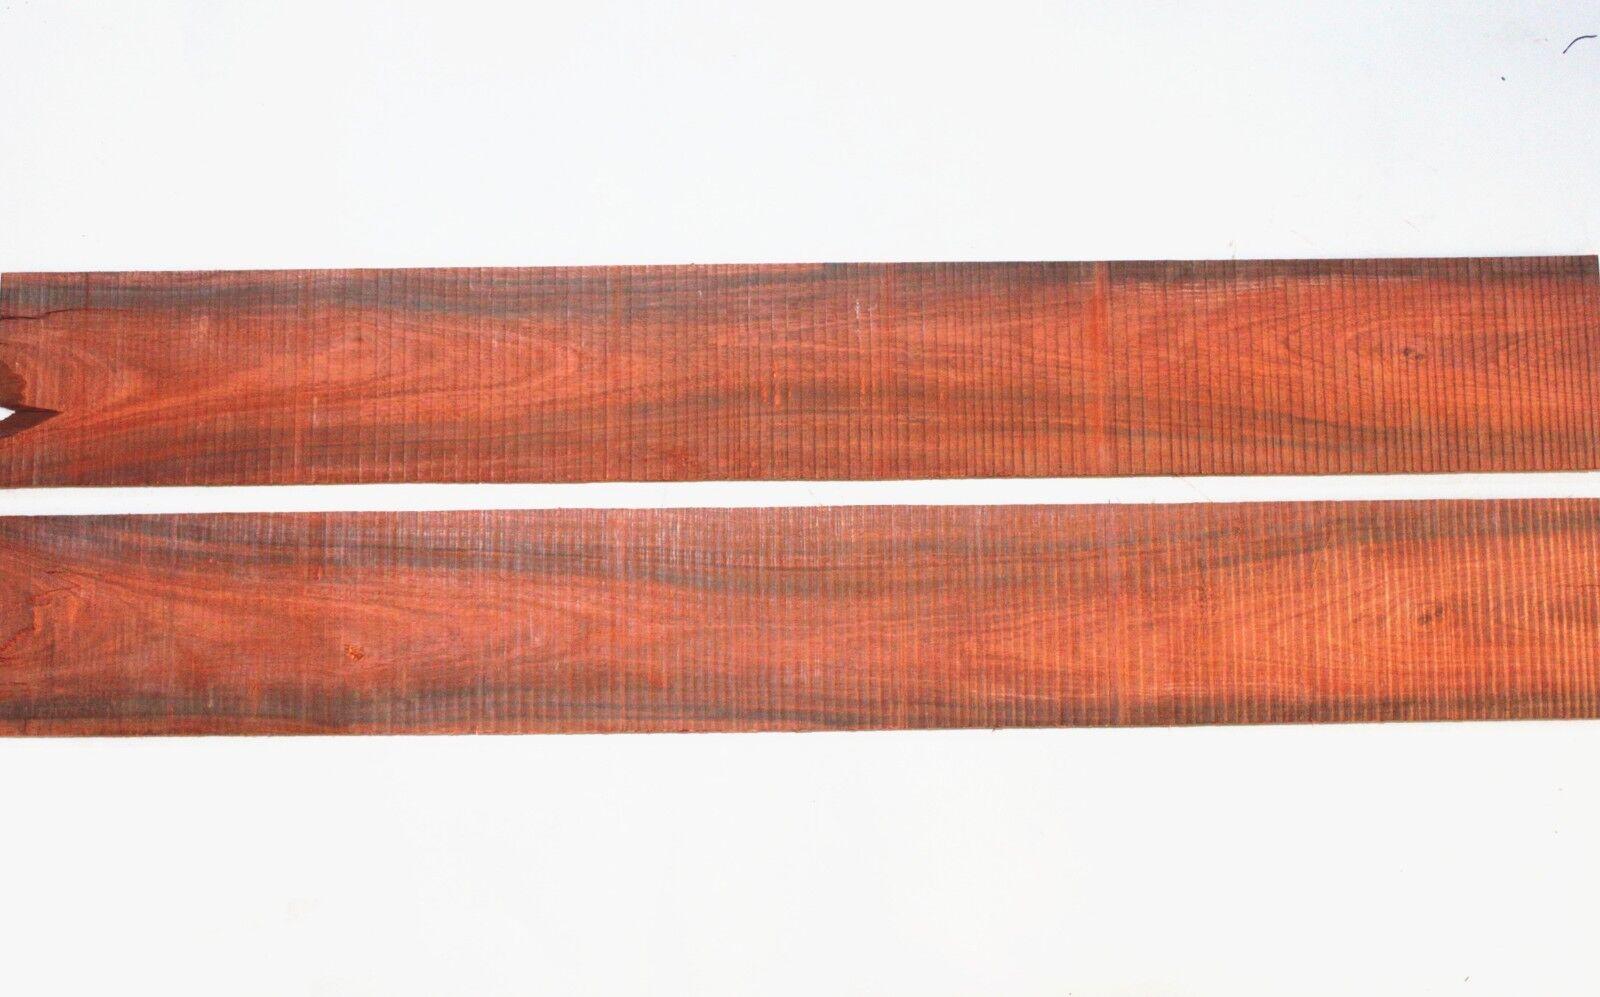 JB394 Rosewood Tonewood Guitar Sides Set Acoustic Supply 33.4